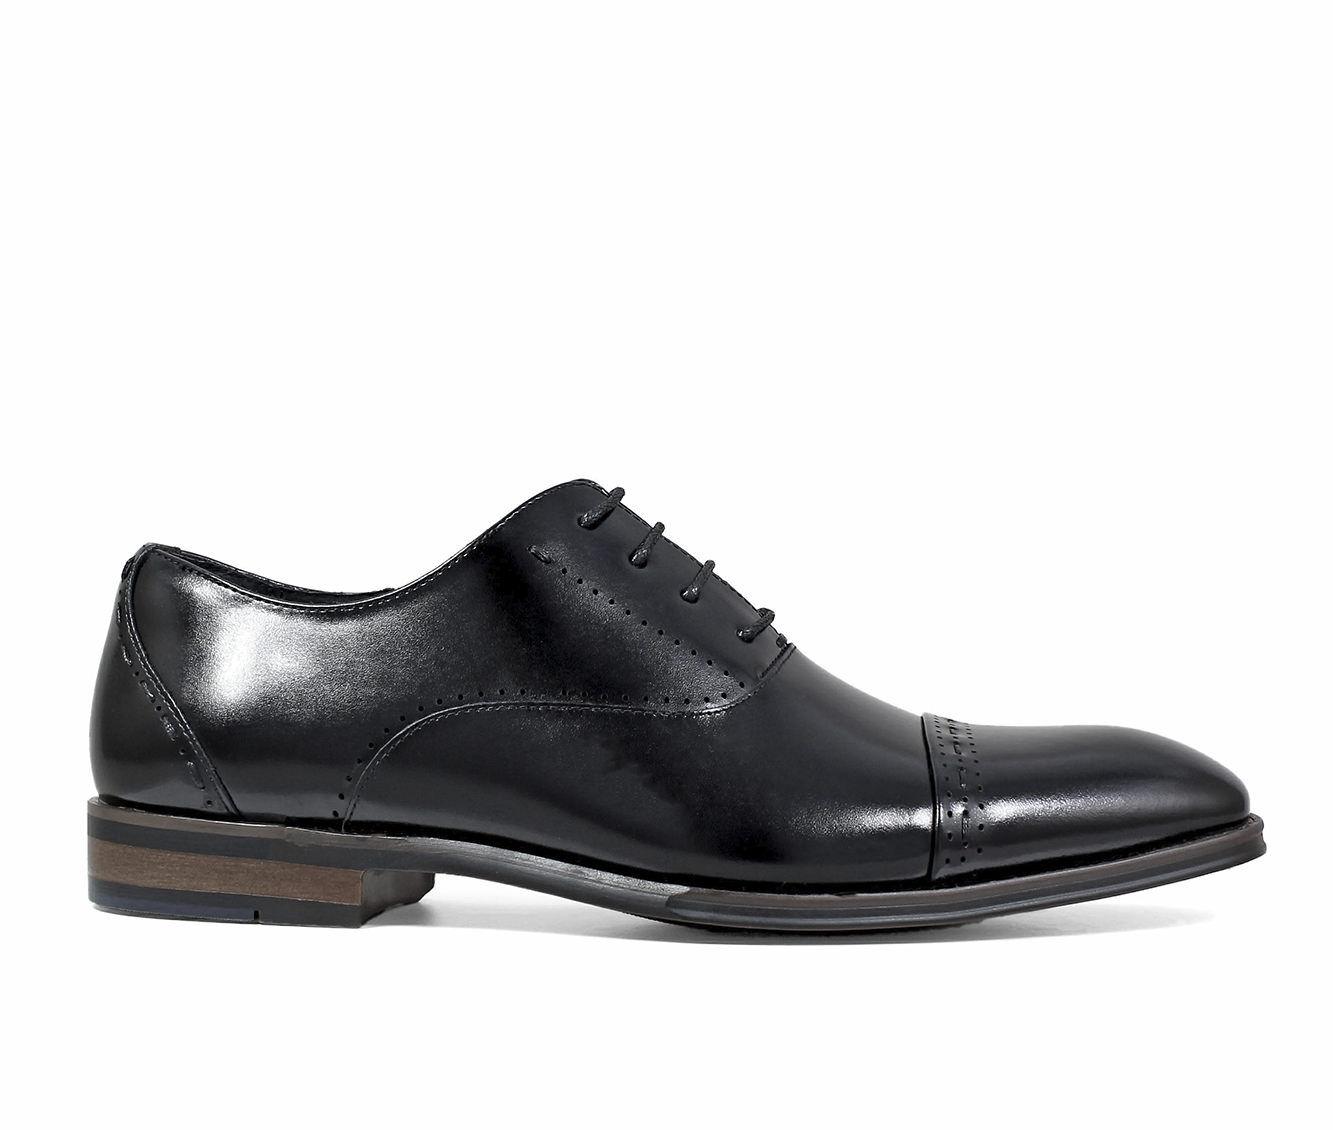 Men's Stacy Adams Barris Cap Toe Oxford Dress Shoes Black